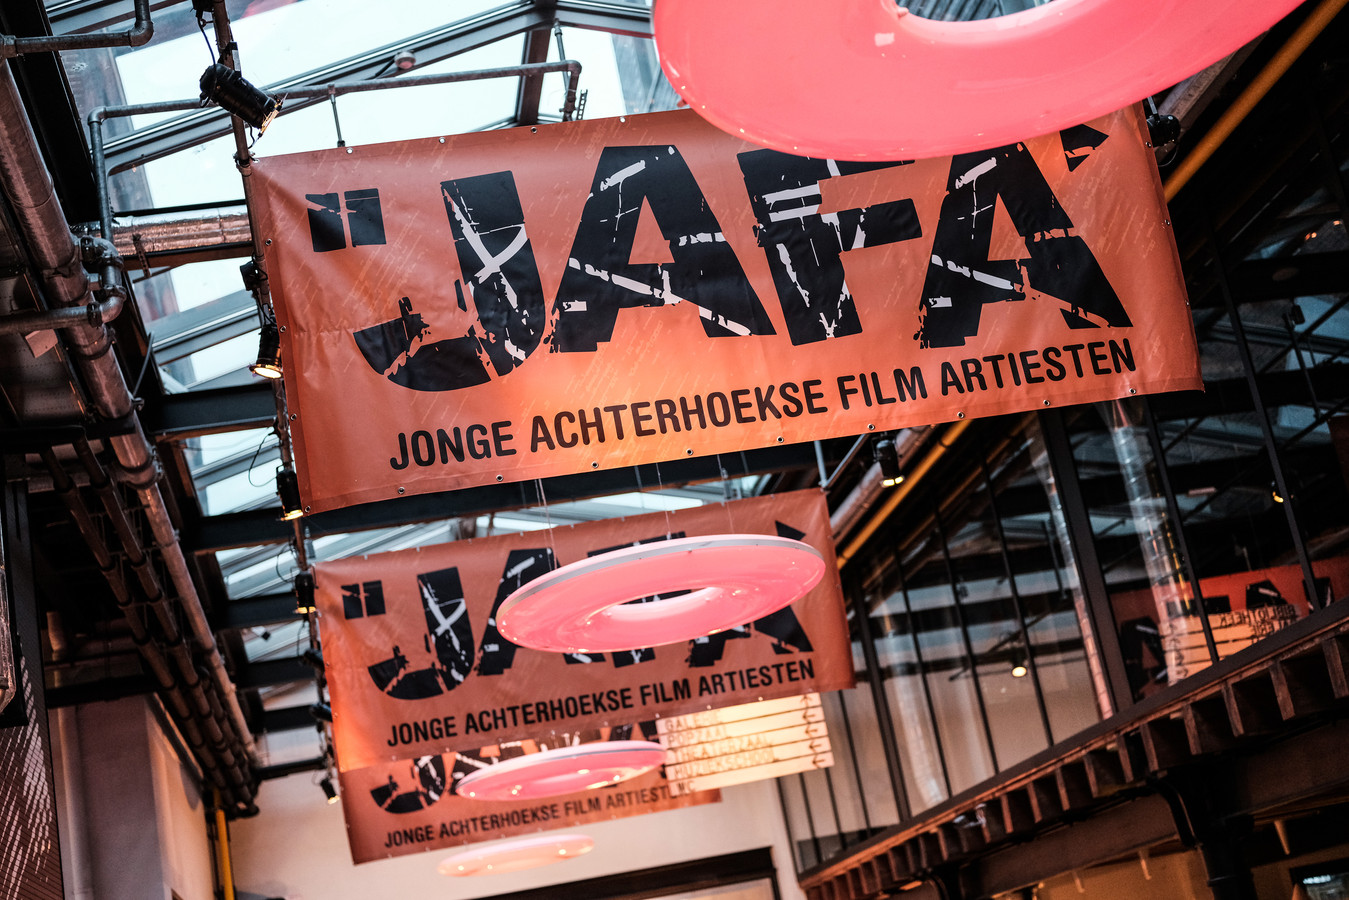 JV 06042019 Ulft Dru Film scholieren film festival Jafa / Foto : Jan Ruland van den brink